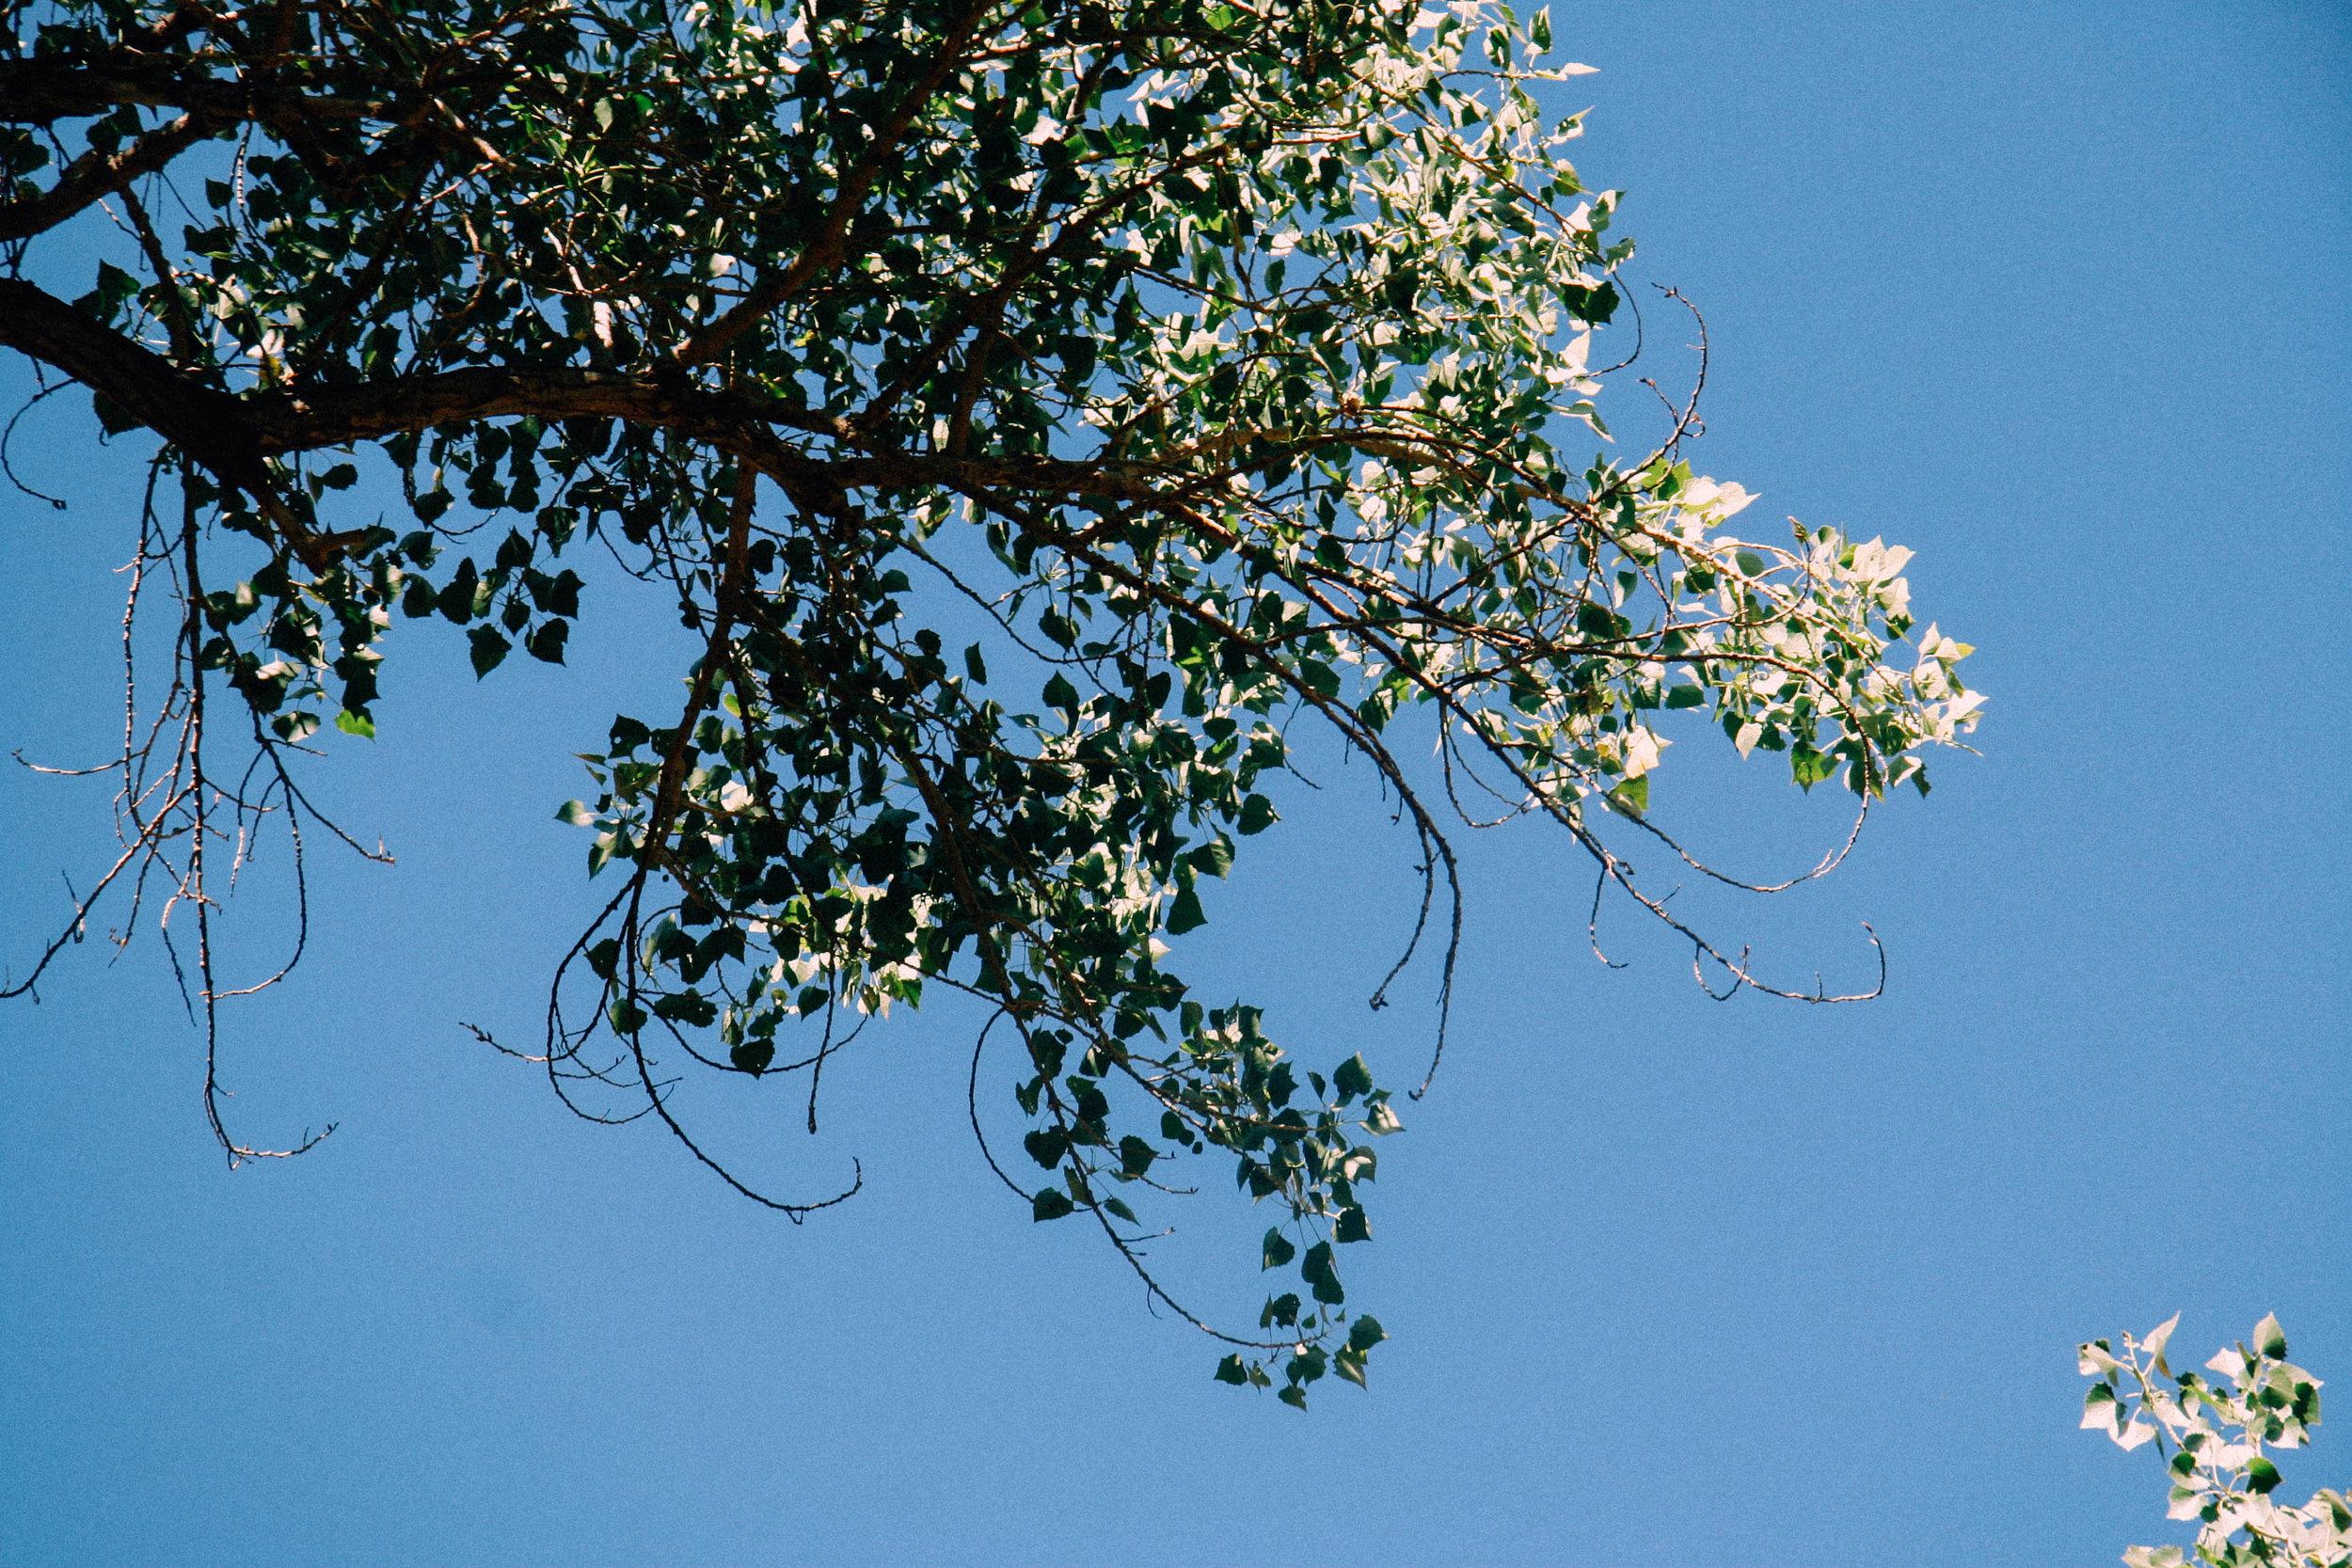 Cottonwood,  Populus fremontii  (Salicaceae)